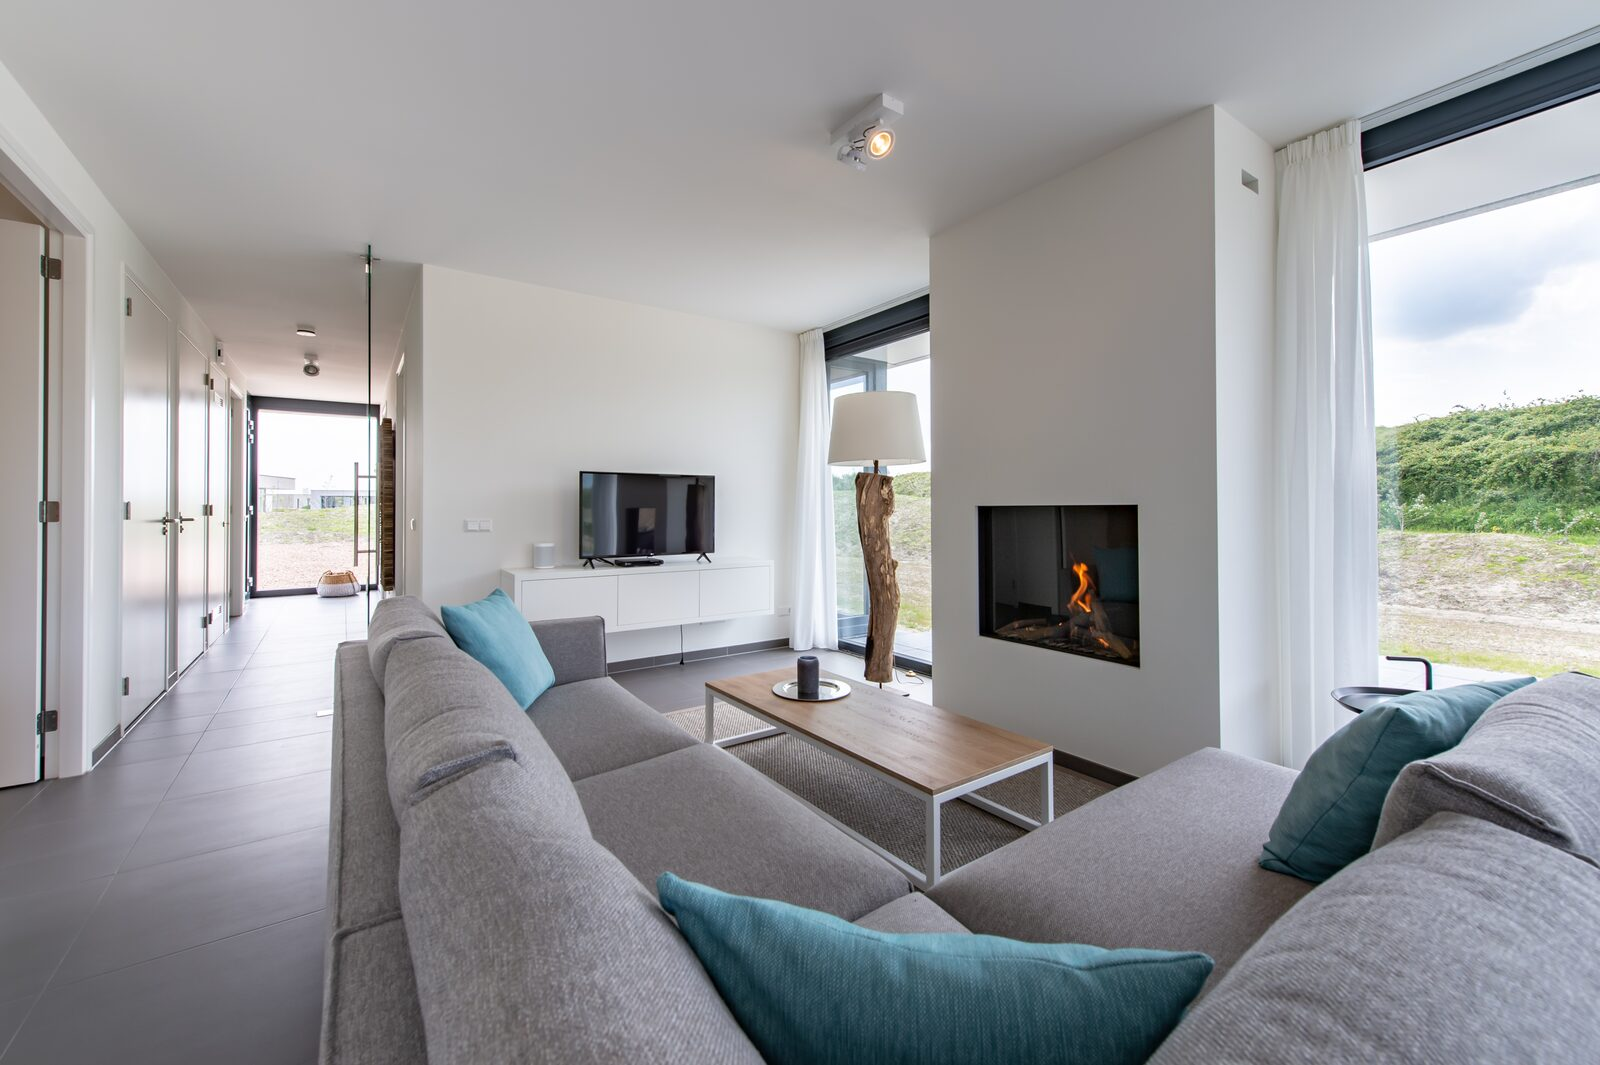 Luxus-Ferienvilla zeeland duinvallei 1 de groote duynen